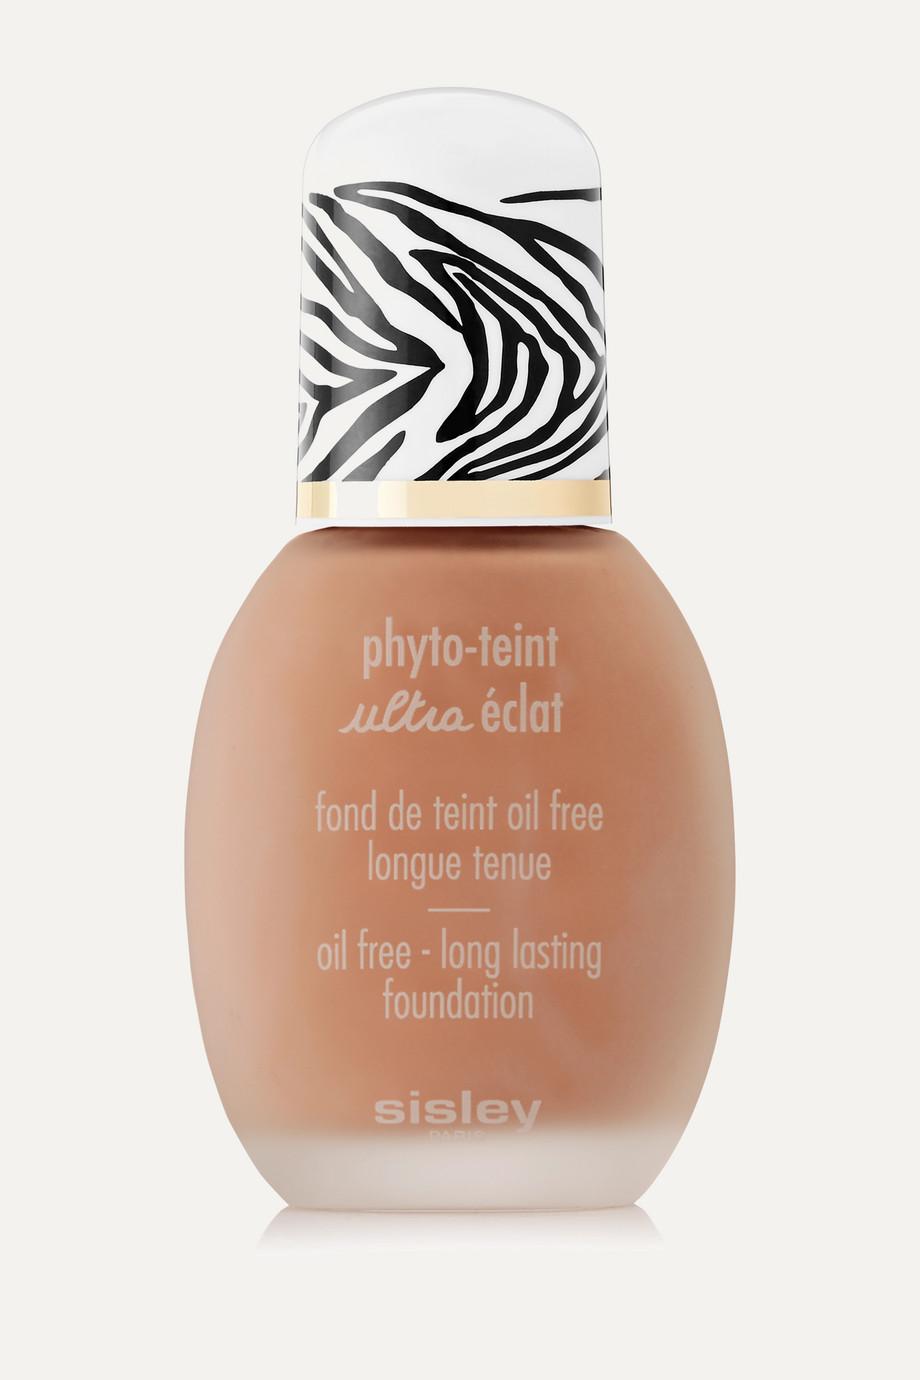 Sisley Phyto-Teint Ultra Éclat Radiance Boosting Foundation - 6+ Chestnut, 30ml